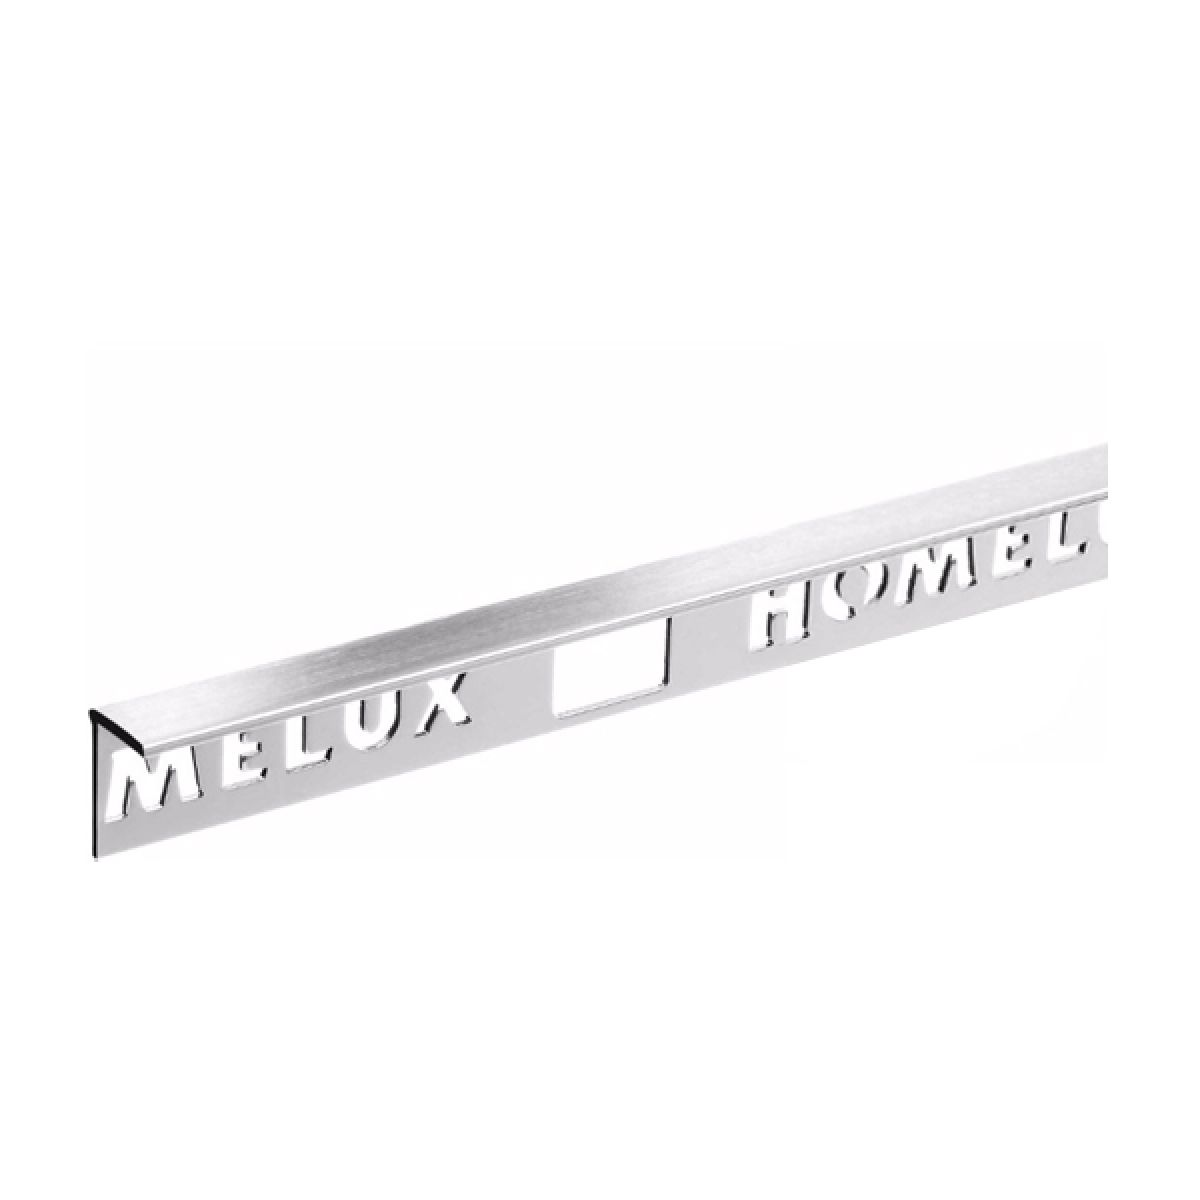 Homelux Aluminium Straight Edge 6mm Stainless Steel Tile Trim 2.5m